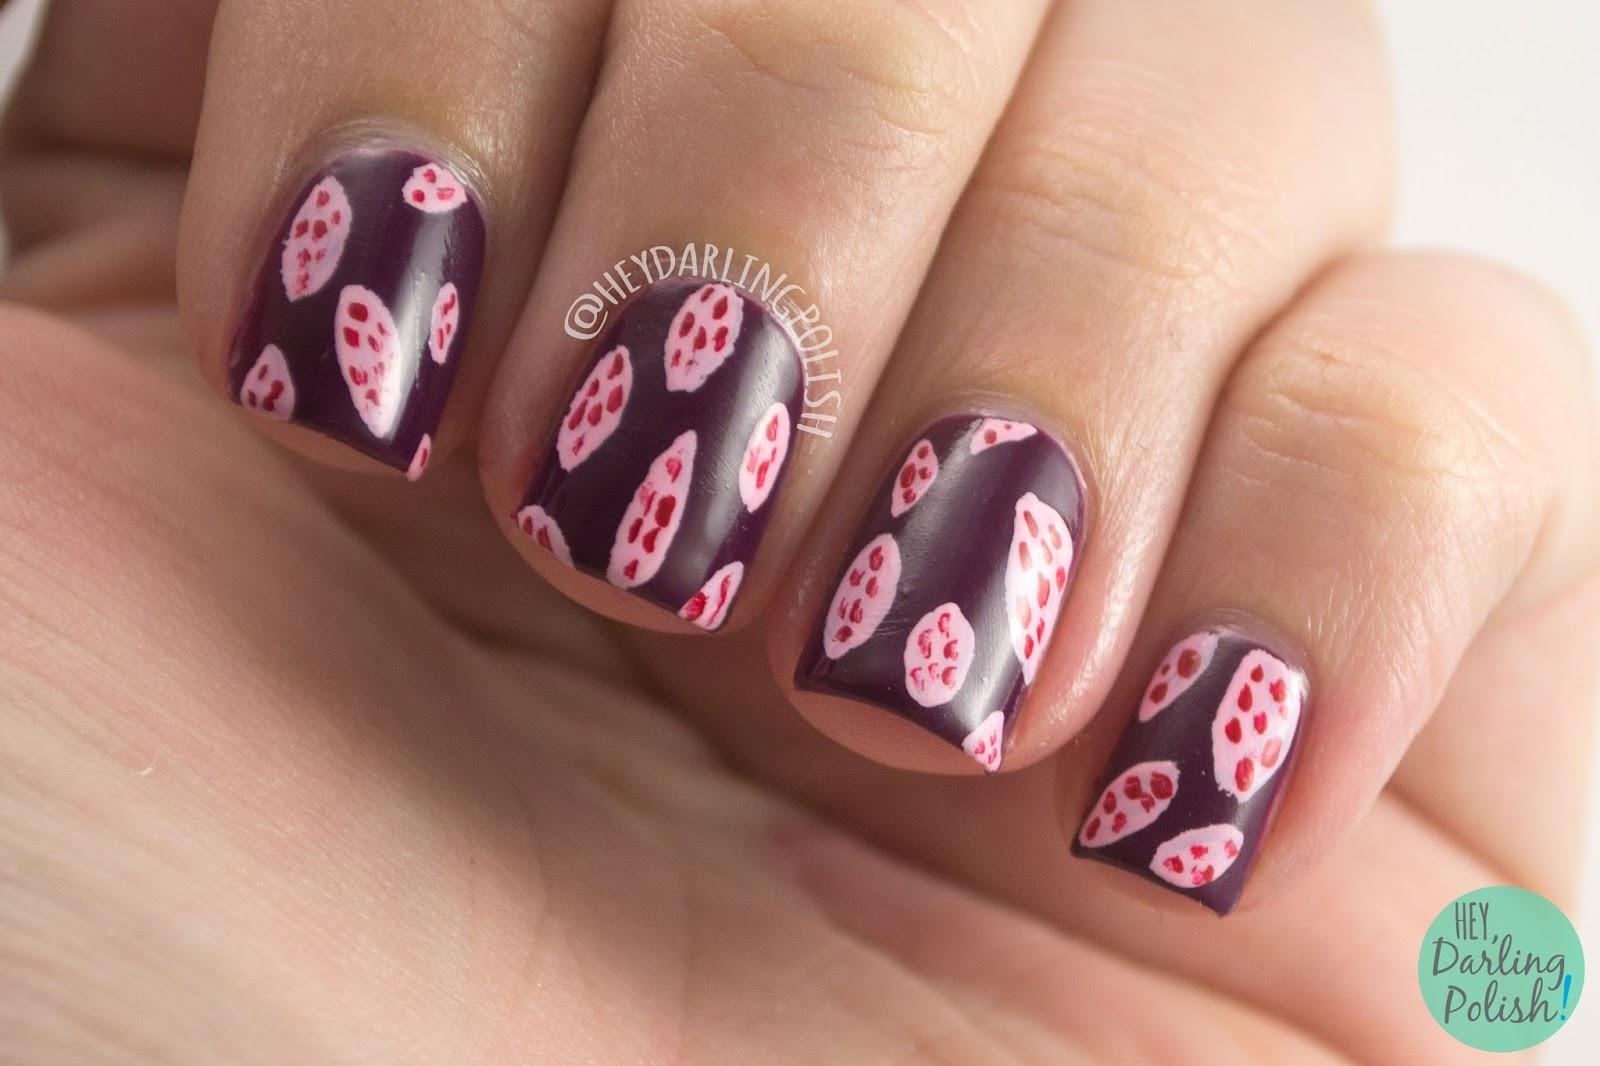 nails, nail art, nail polish, hey darling polish, black dahlia lacquer, indie polish, blood roses, wine berry, pattern